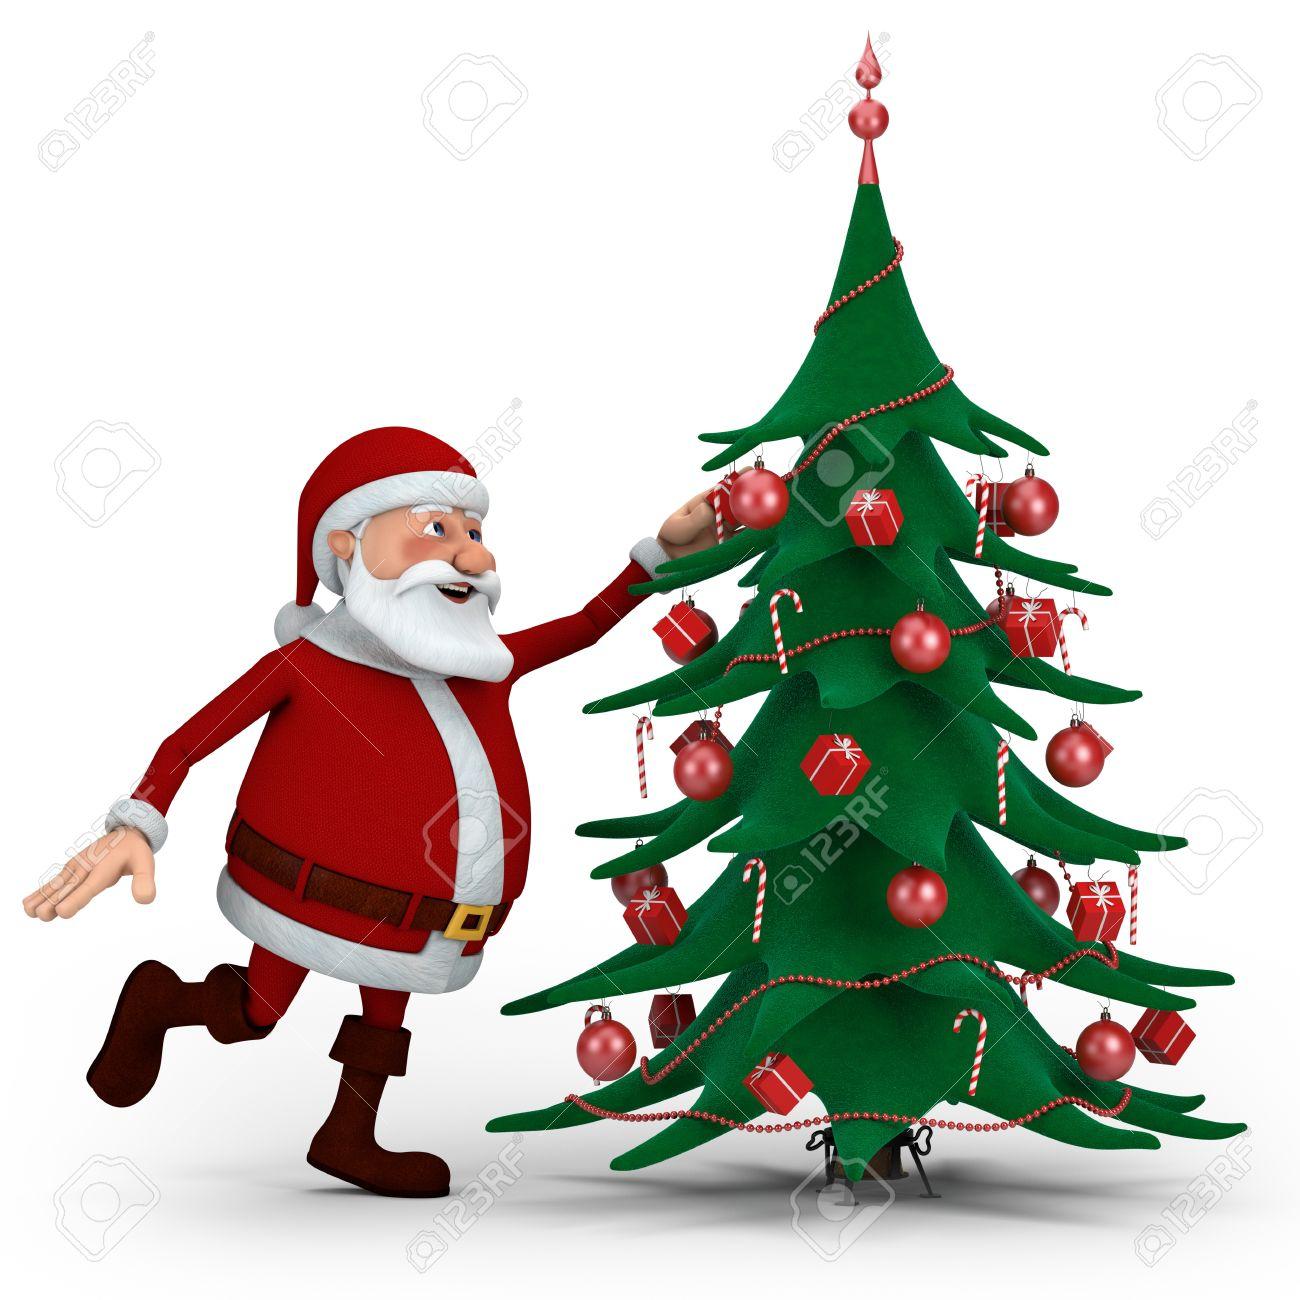 Cartoon Santa Claus Decorating Christmas Tree High Quality  - Quality Christmas Tree